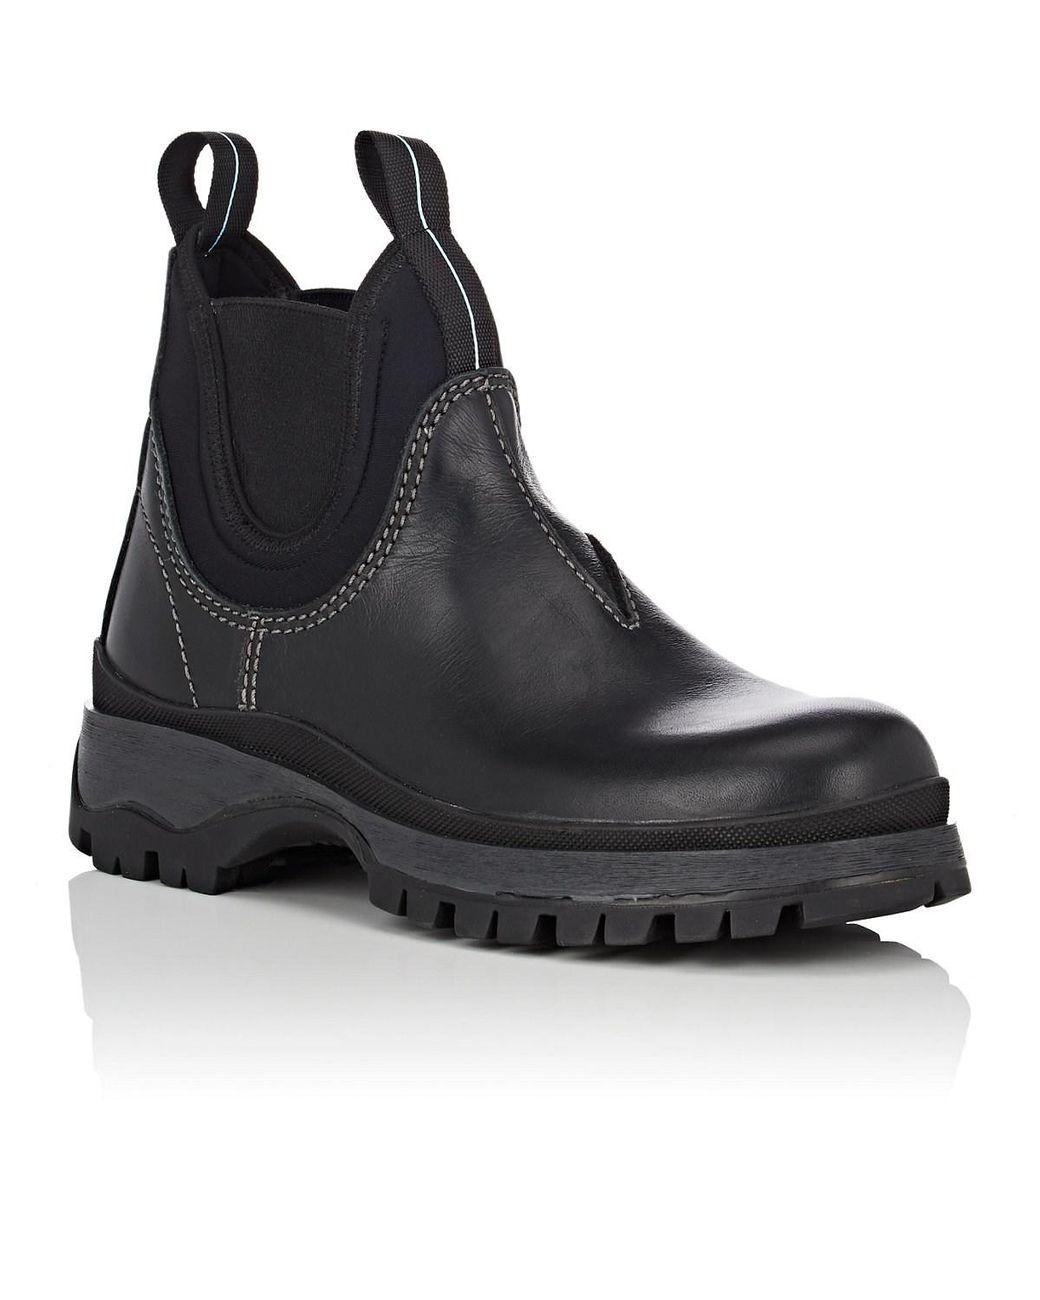 da62cbc7960 Women's Black Lug-sole Leather & Neoprene Chelsea Boots